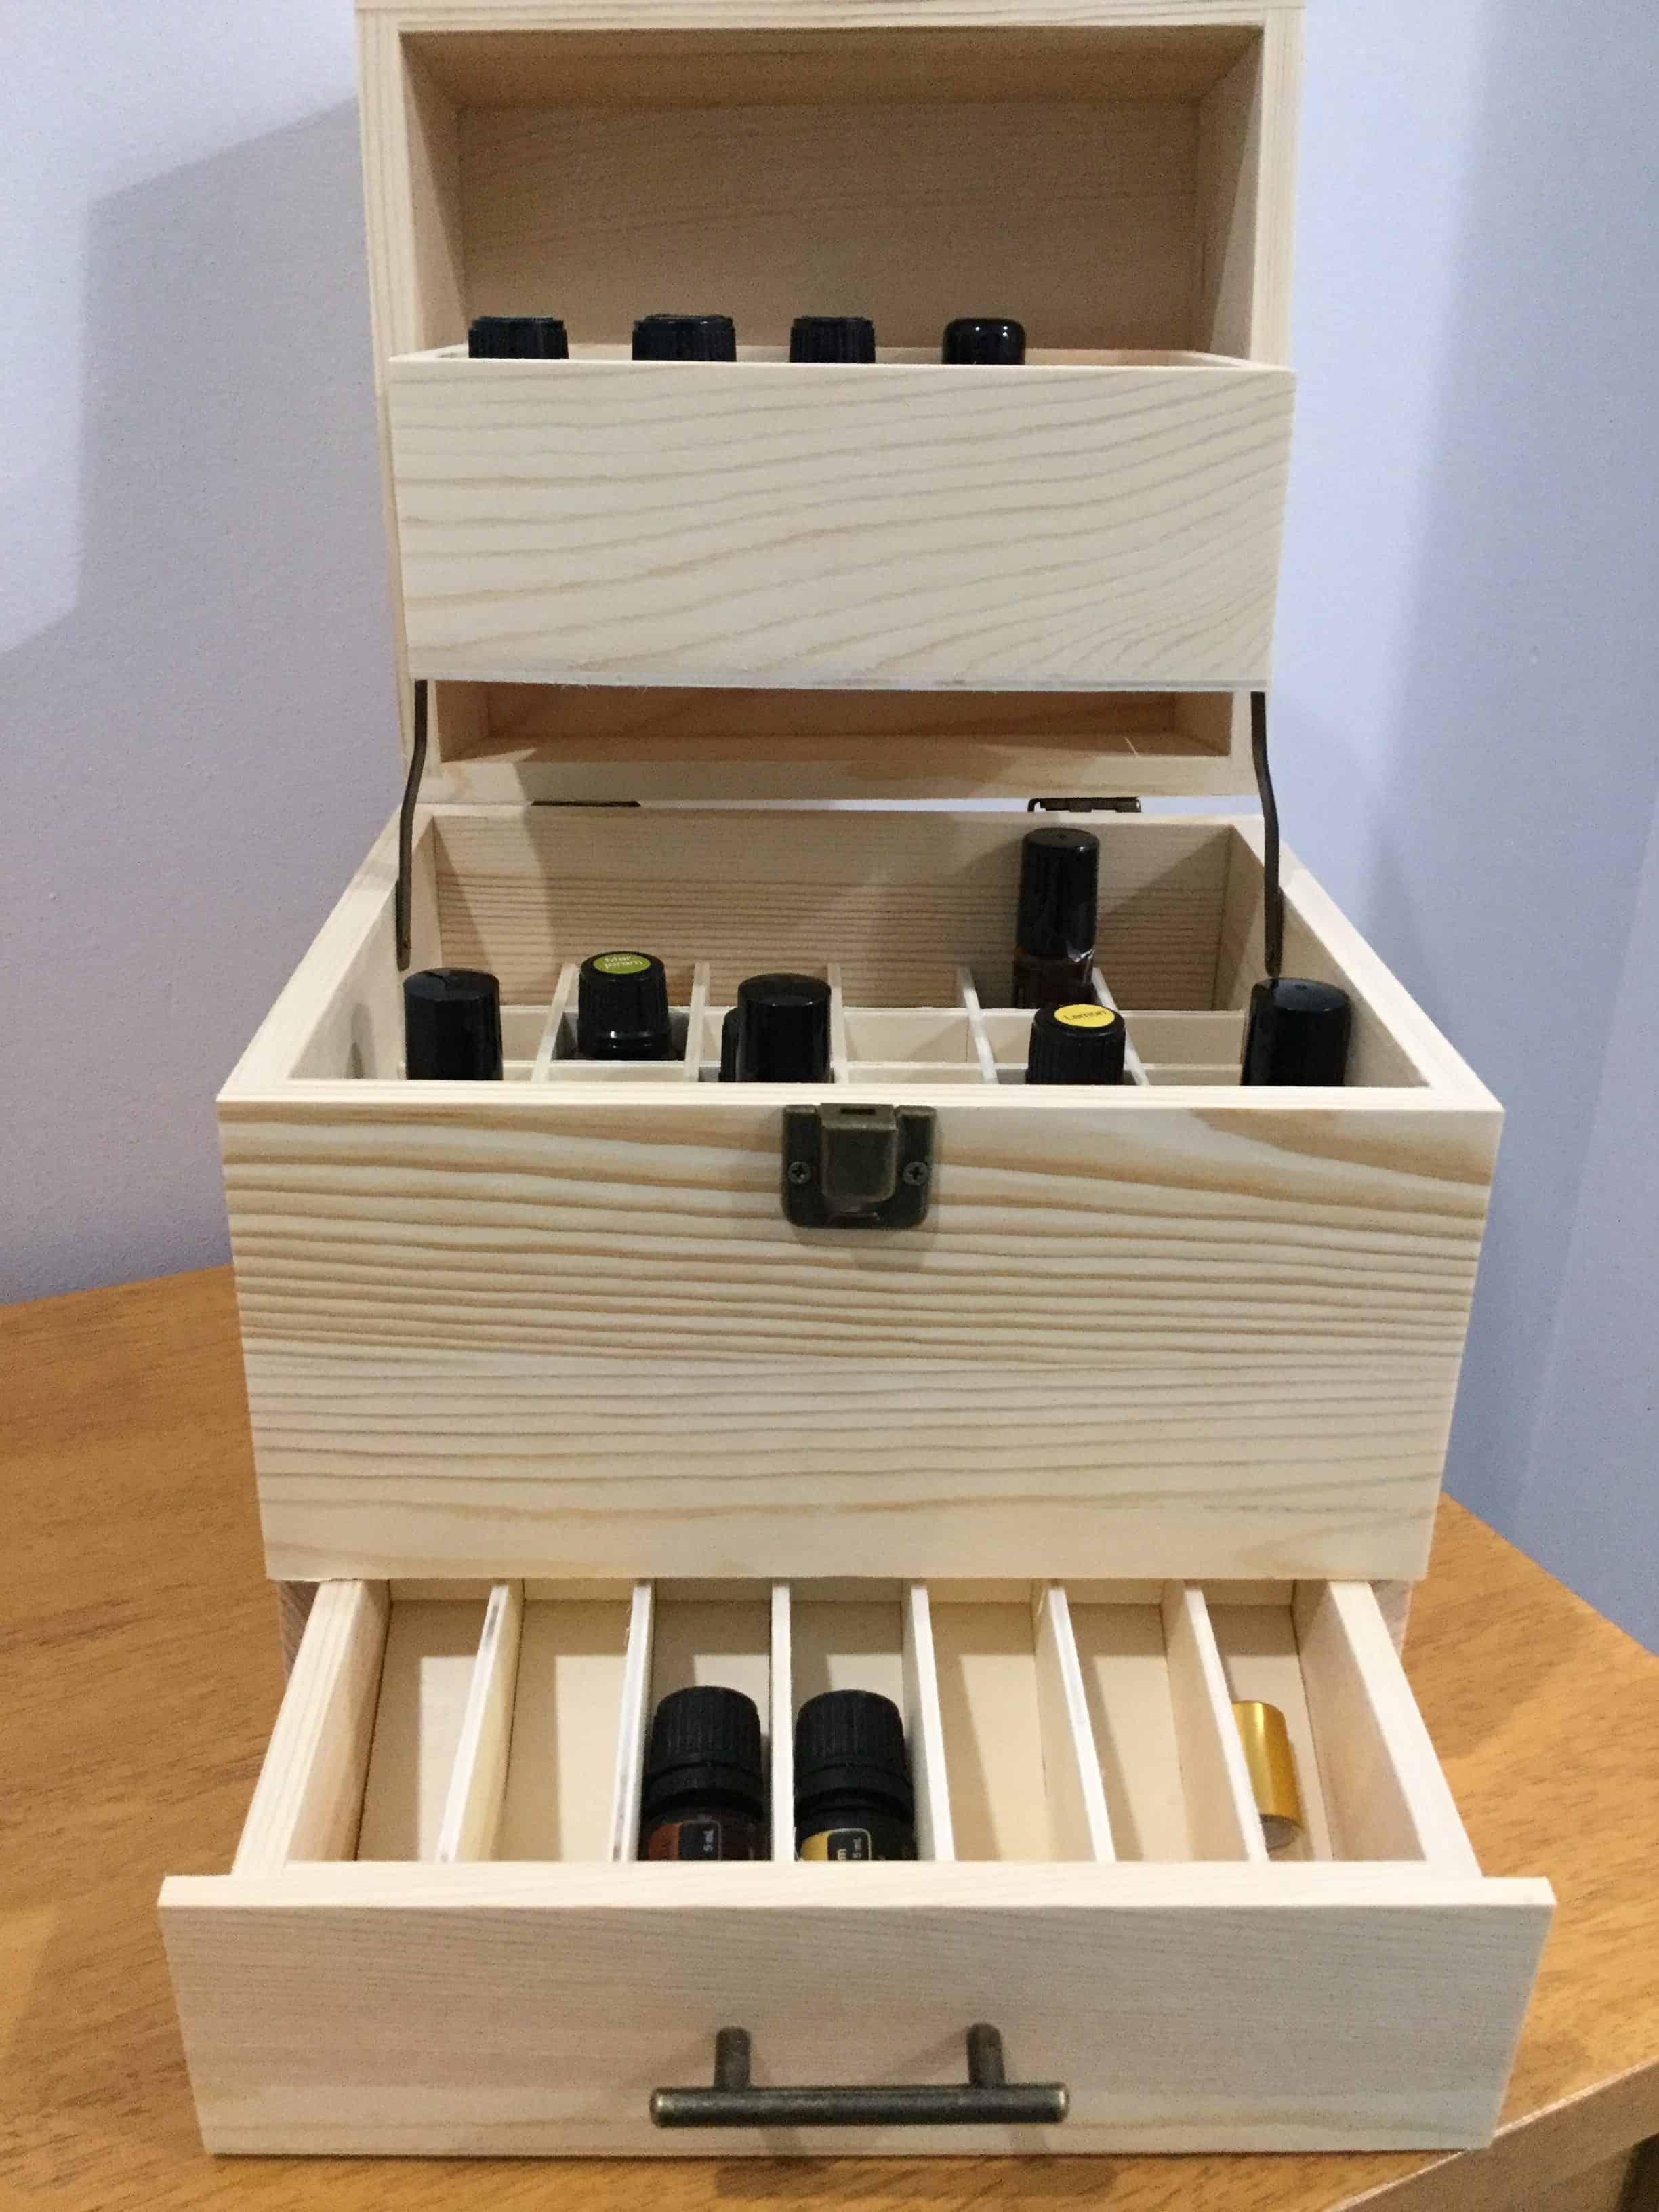 Essential Oil Storage Wooden Box 59 Capacity 3 Tier